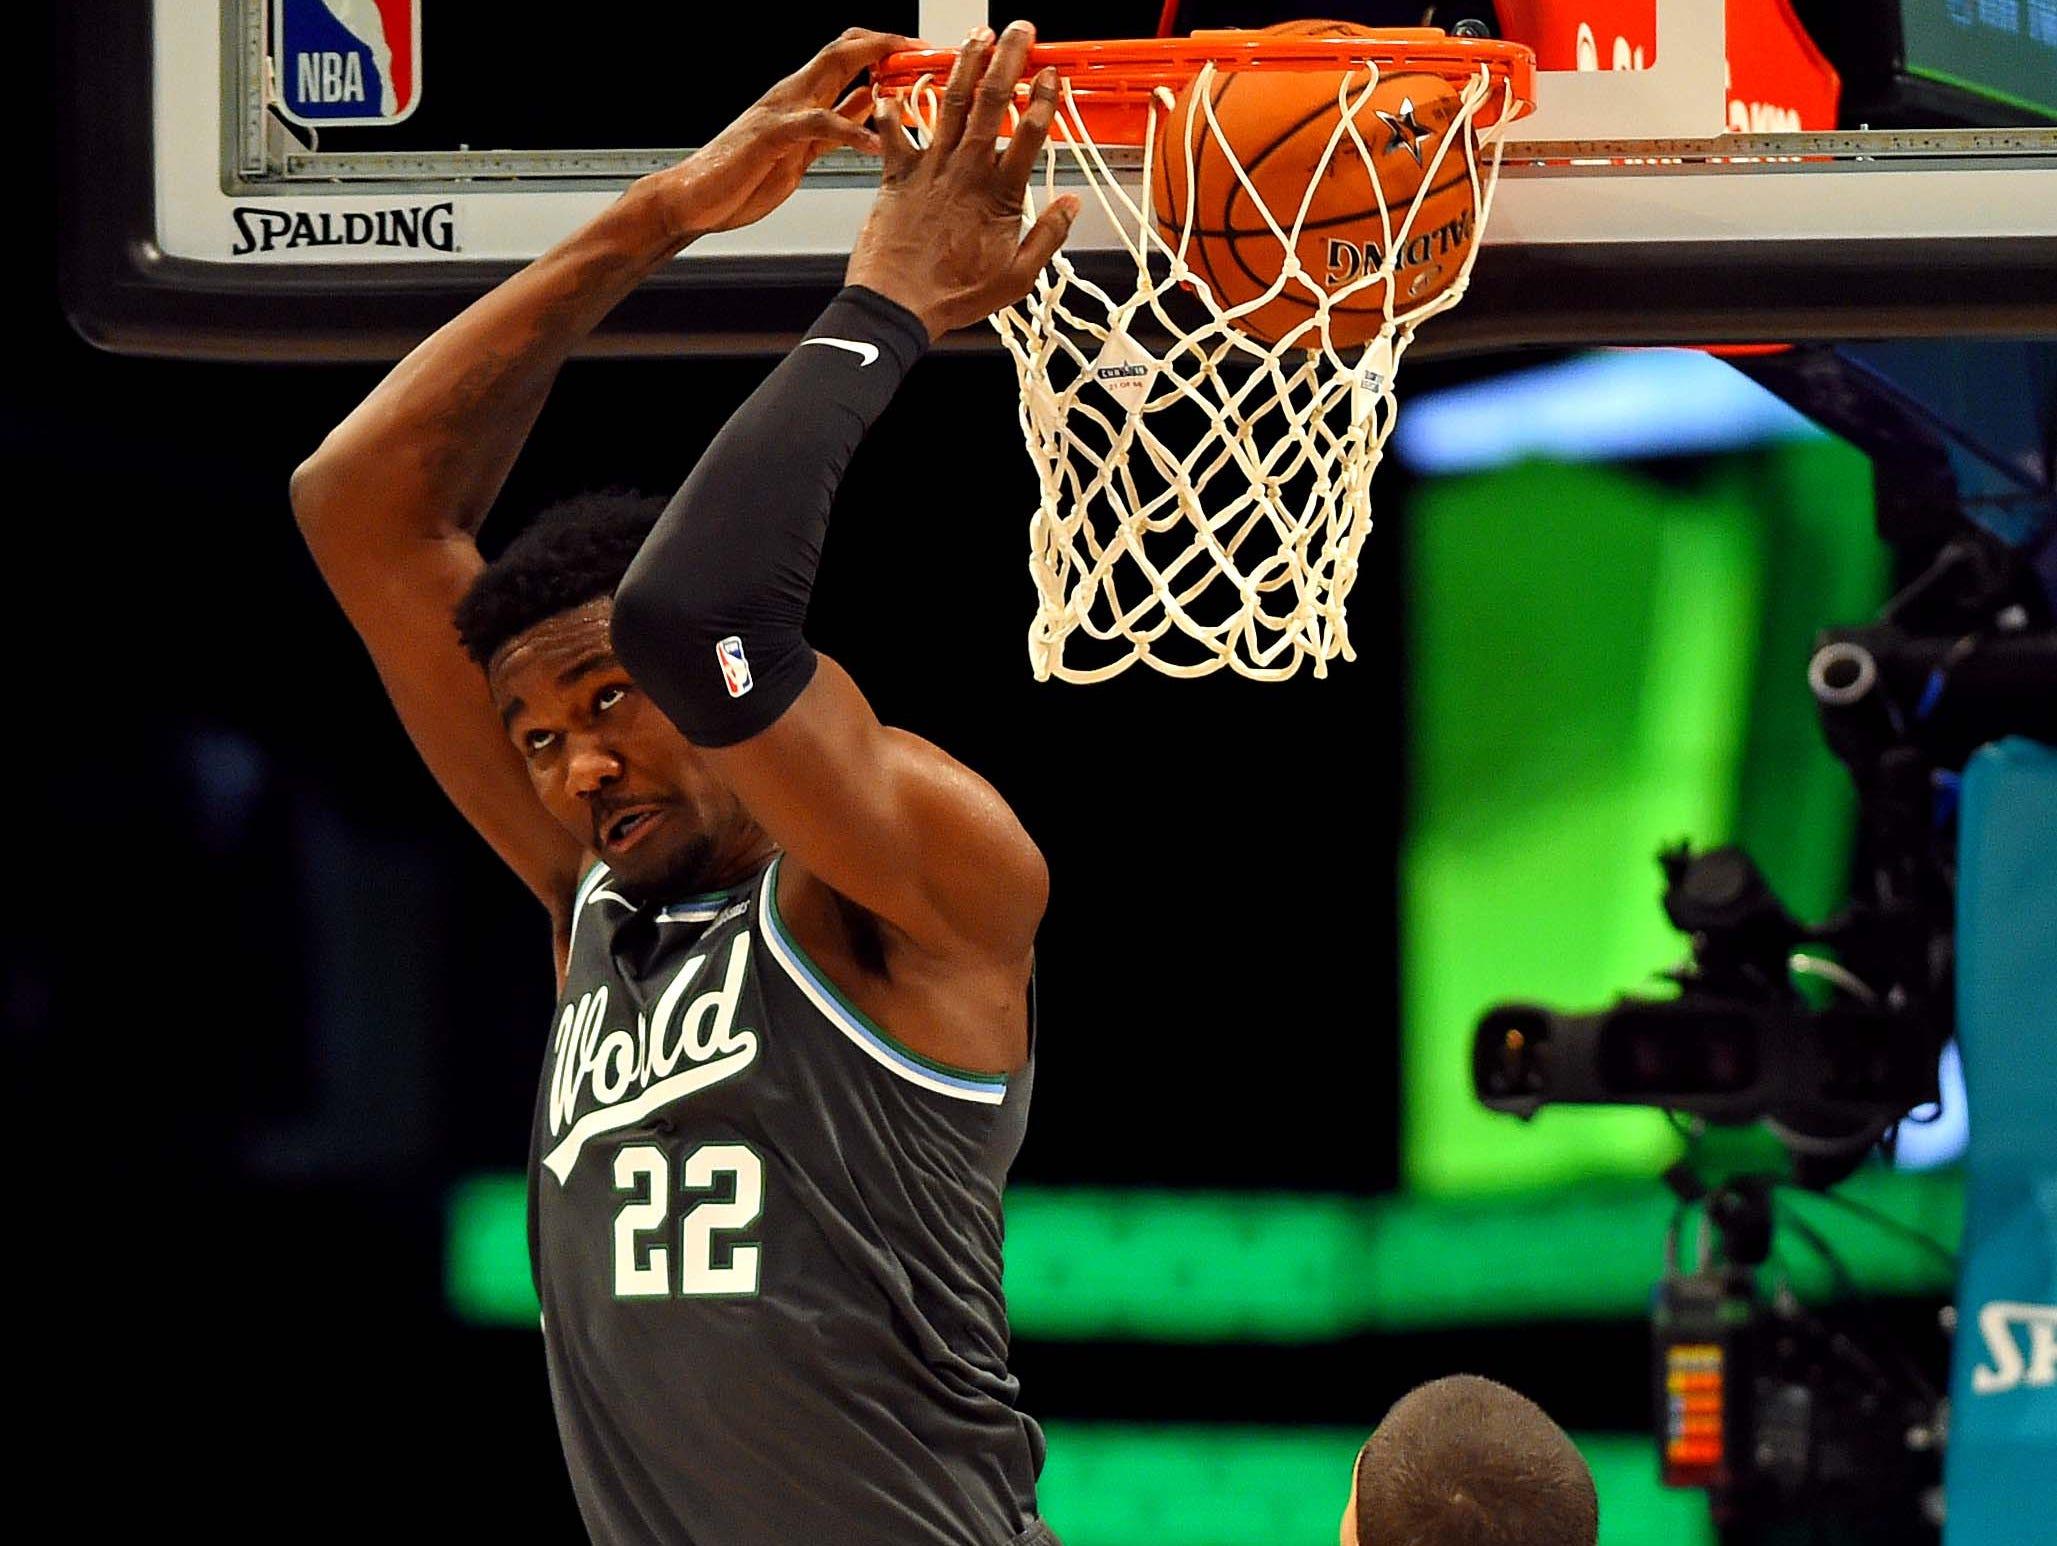 World Team center Deandre Ayton of the Phoenix Suns dunks the ball during the All-Star Rising Stars game.